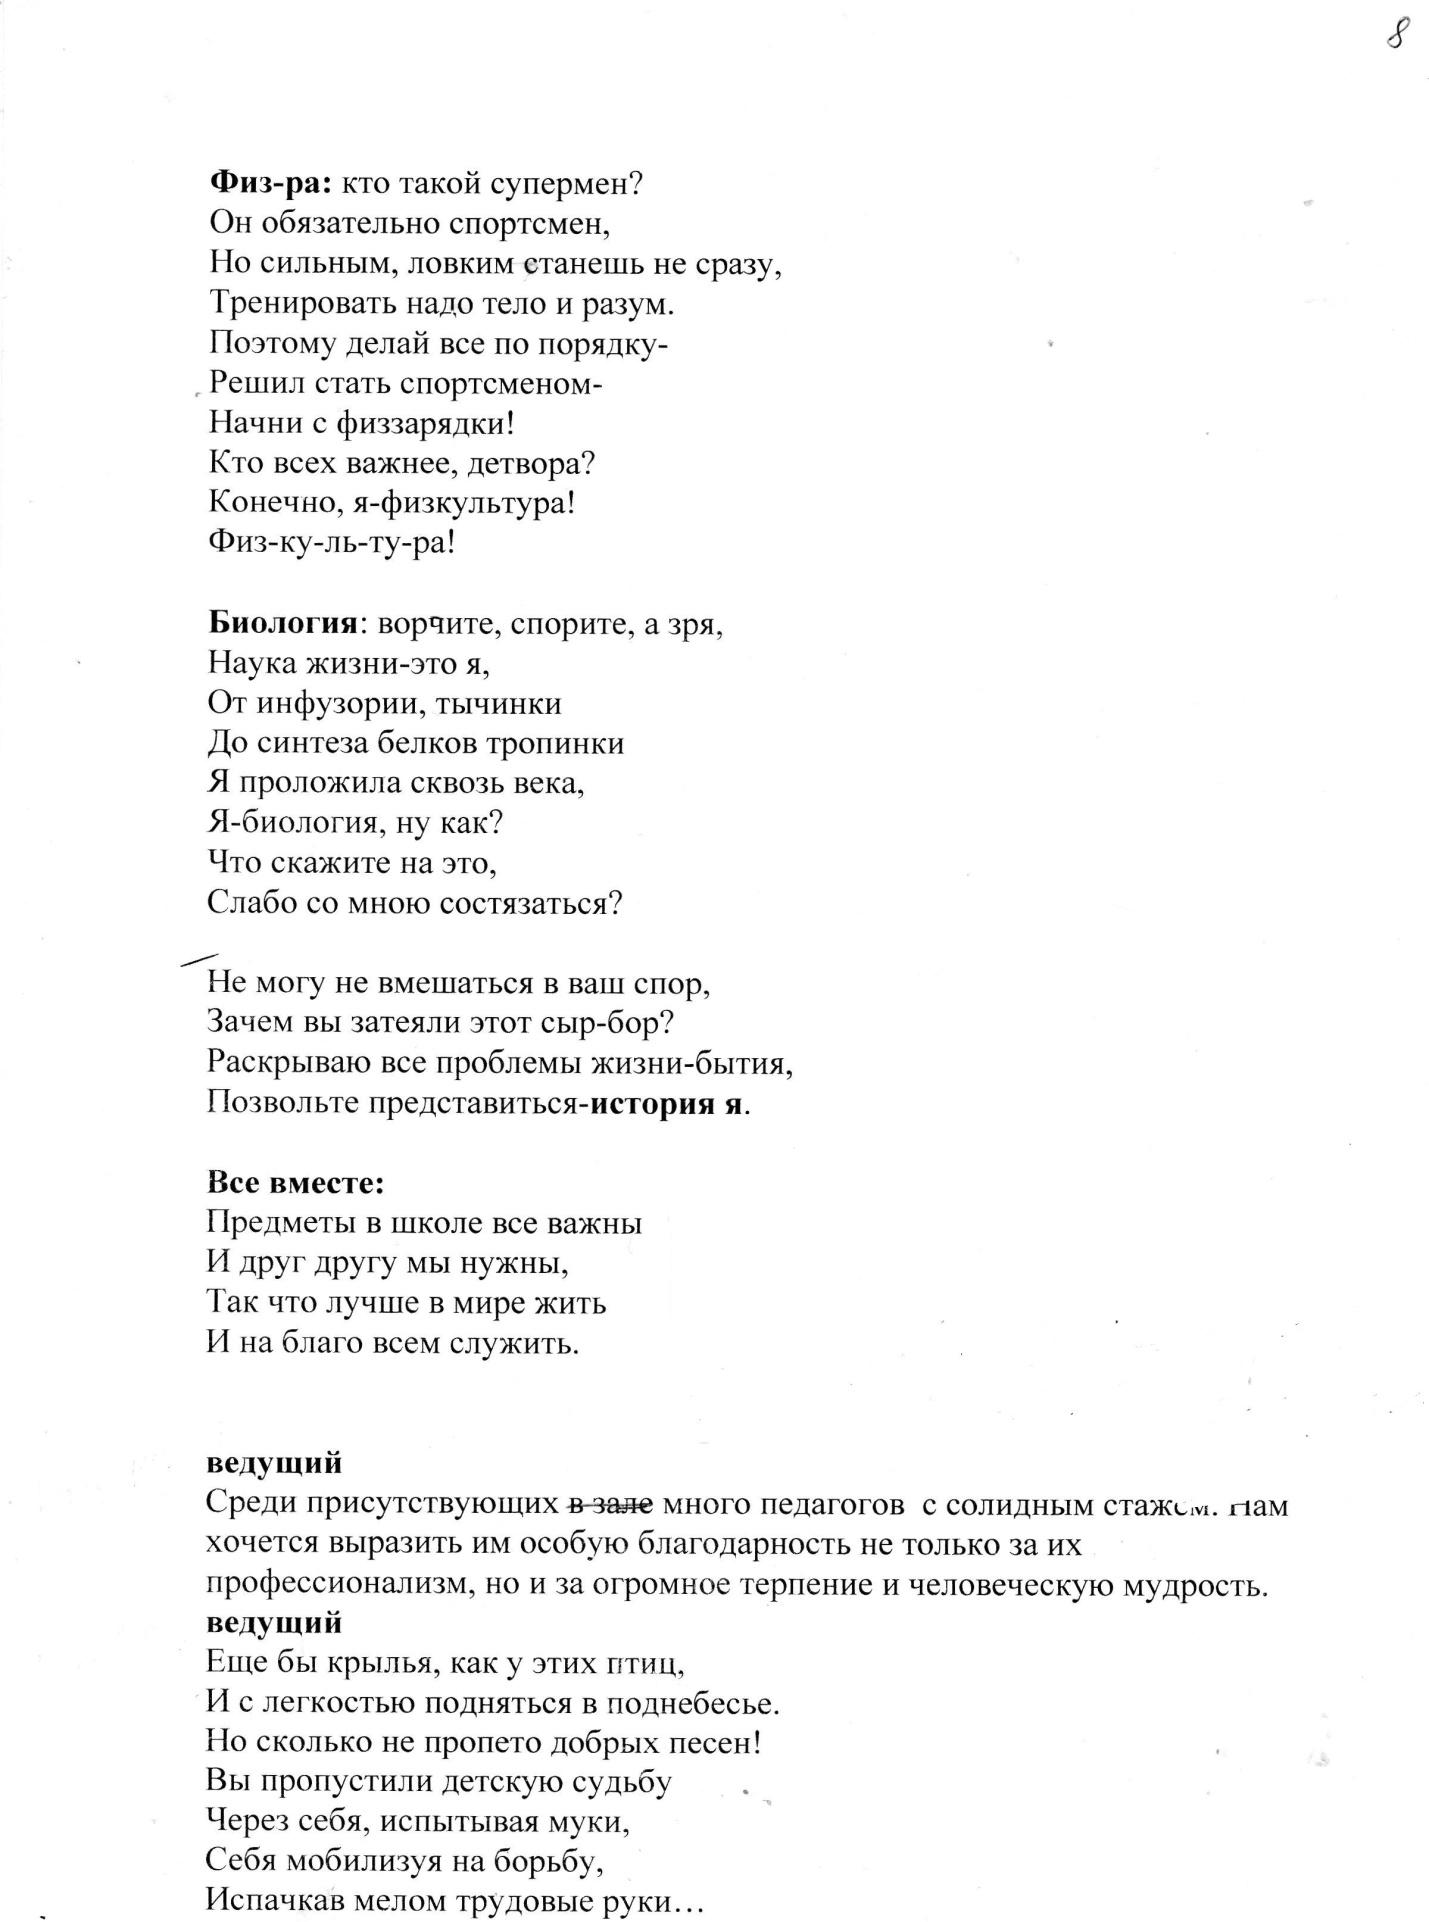 C:\Documents and Settings\ADMIN\Мои документы\Мои рисунки\день учителя\img037.jpg